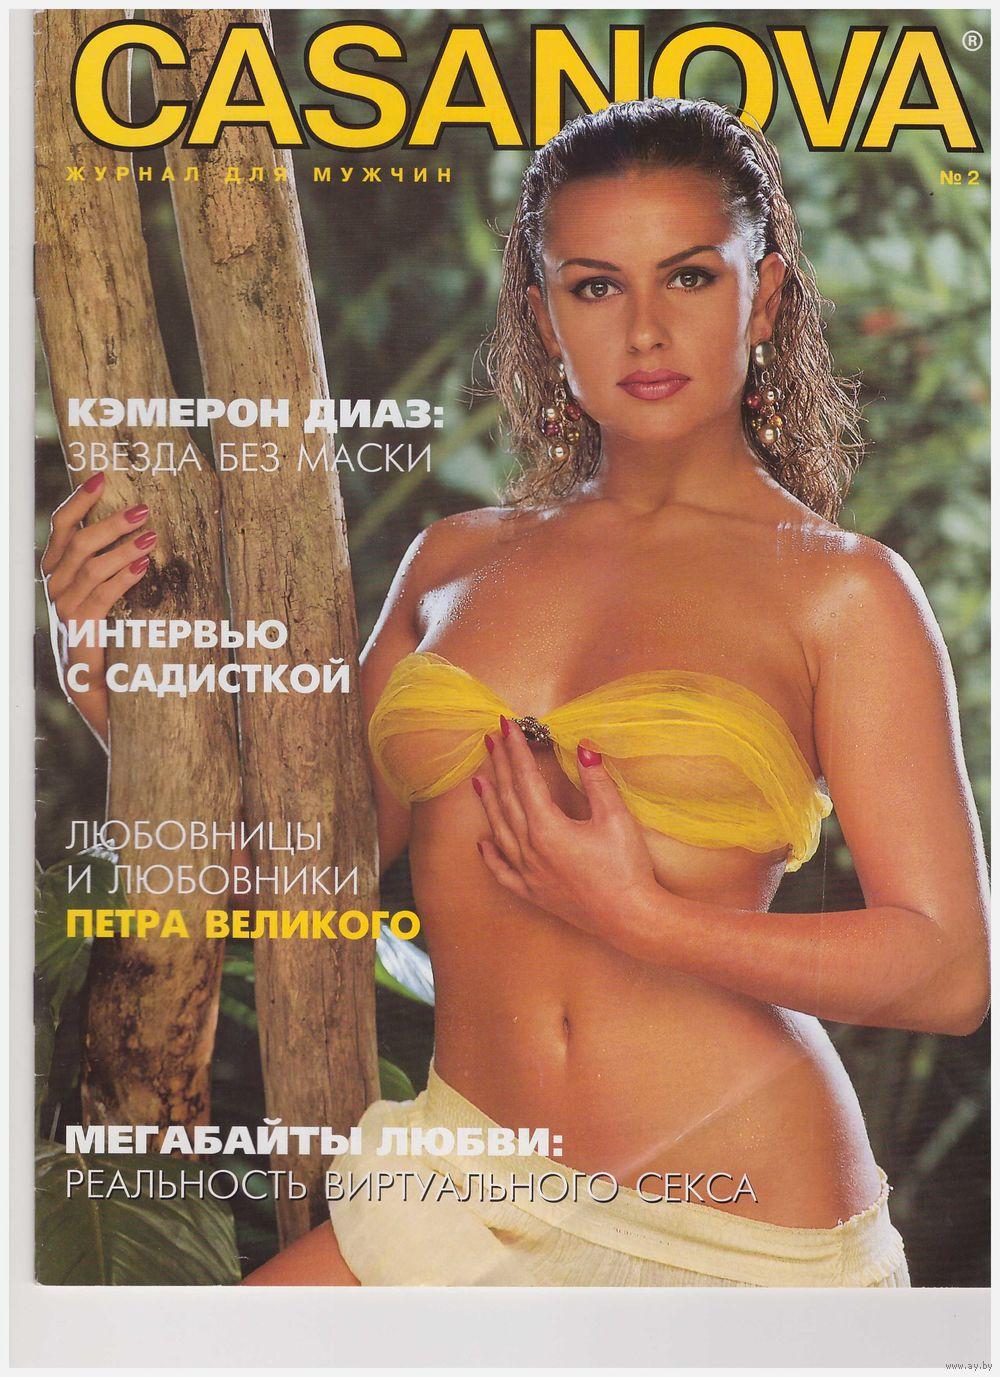 dnevniki-kazanovi-porno